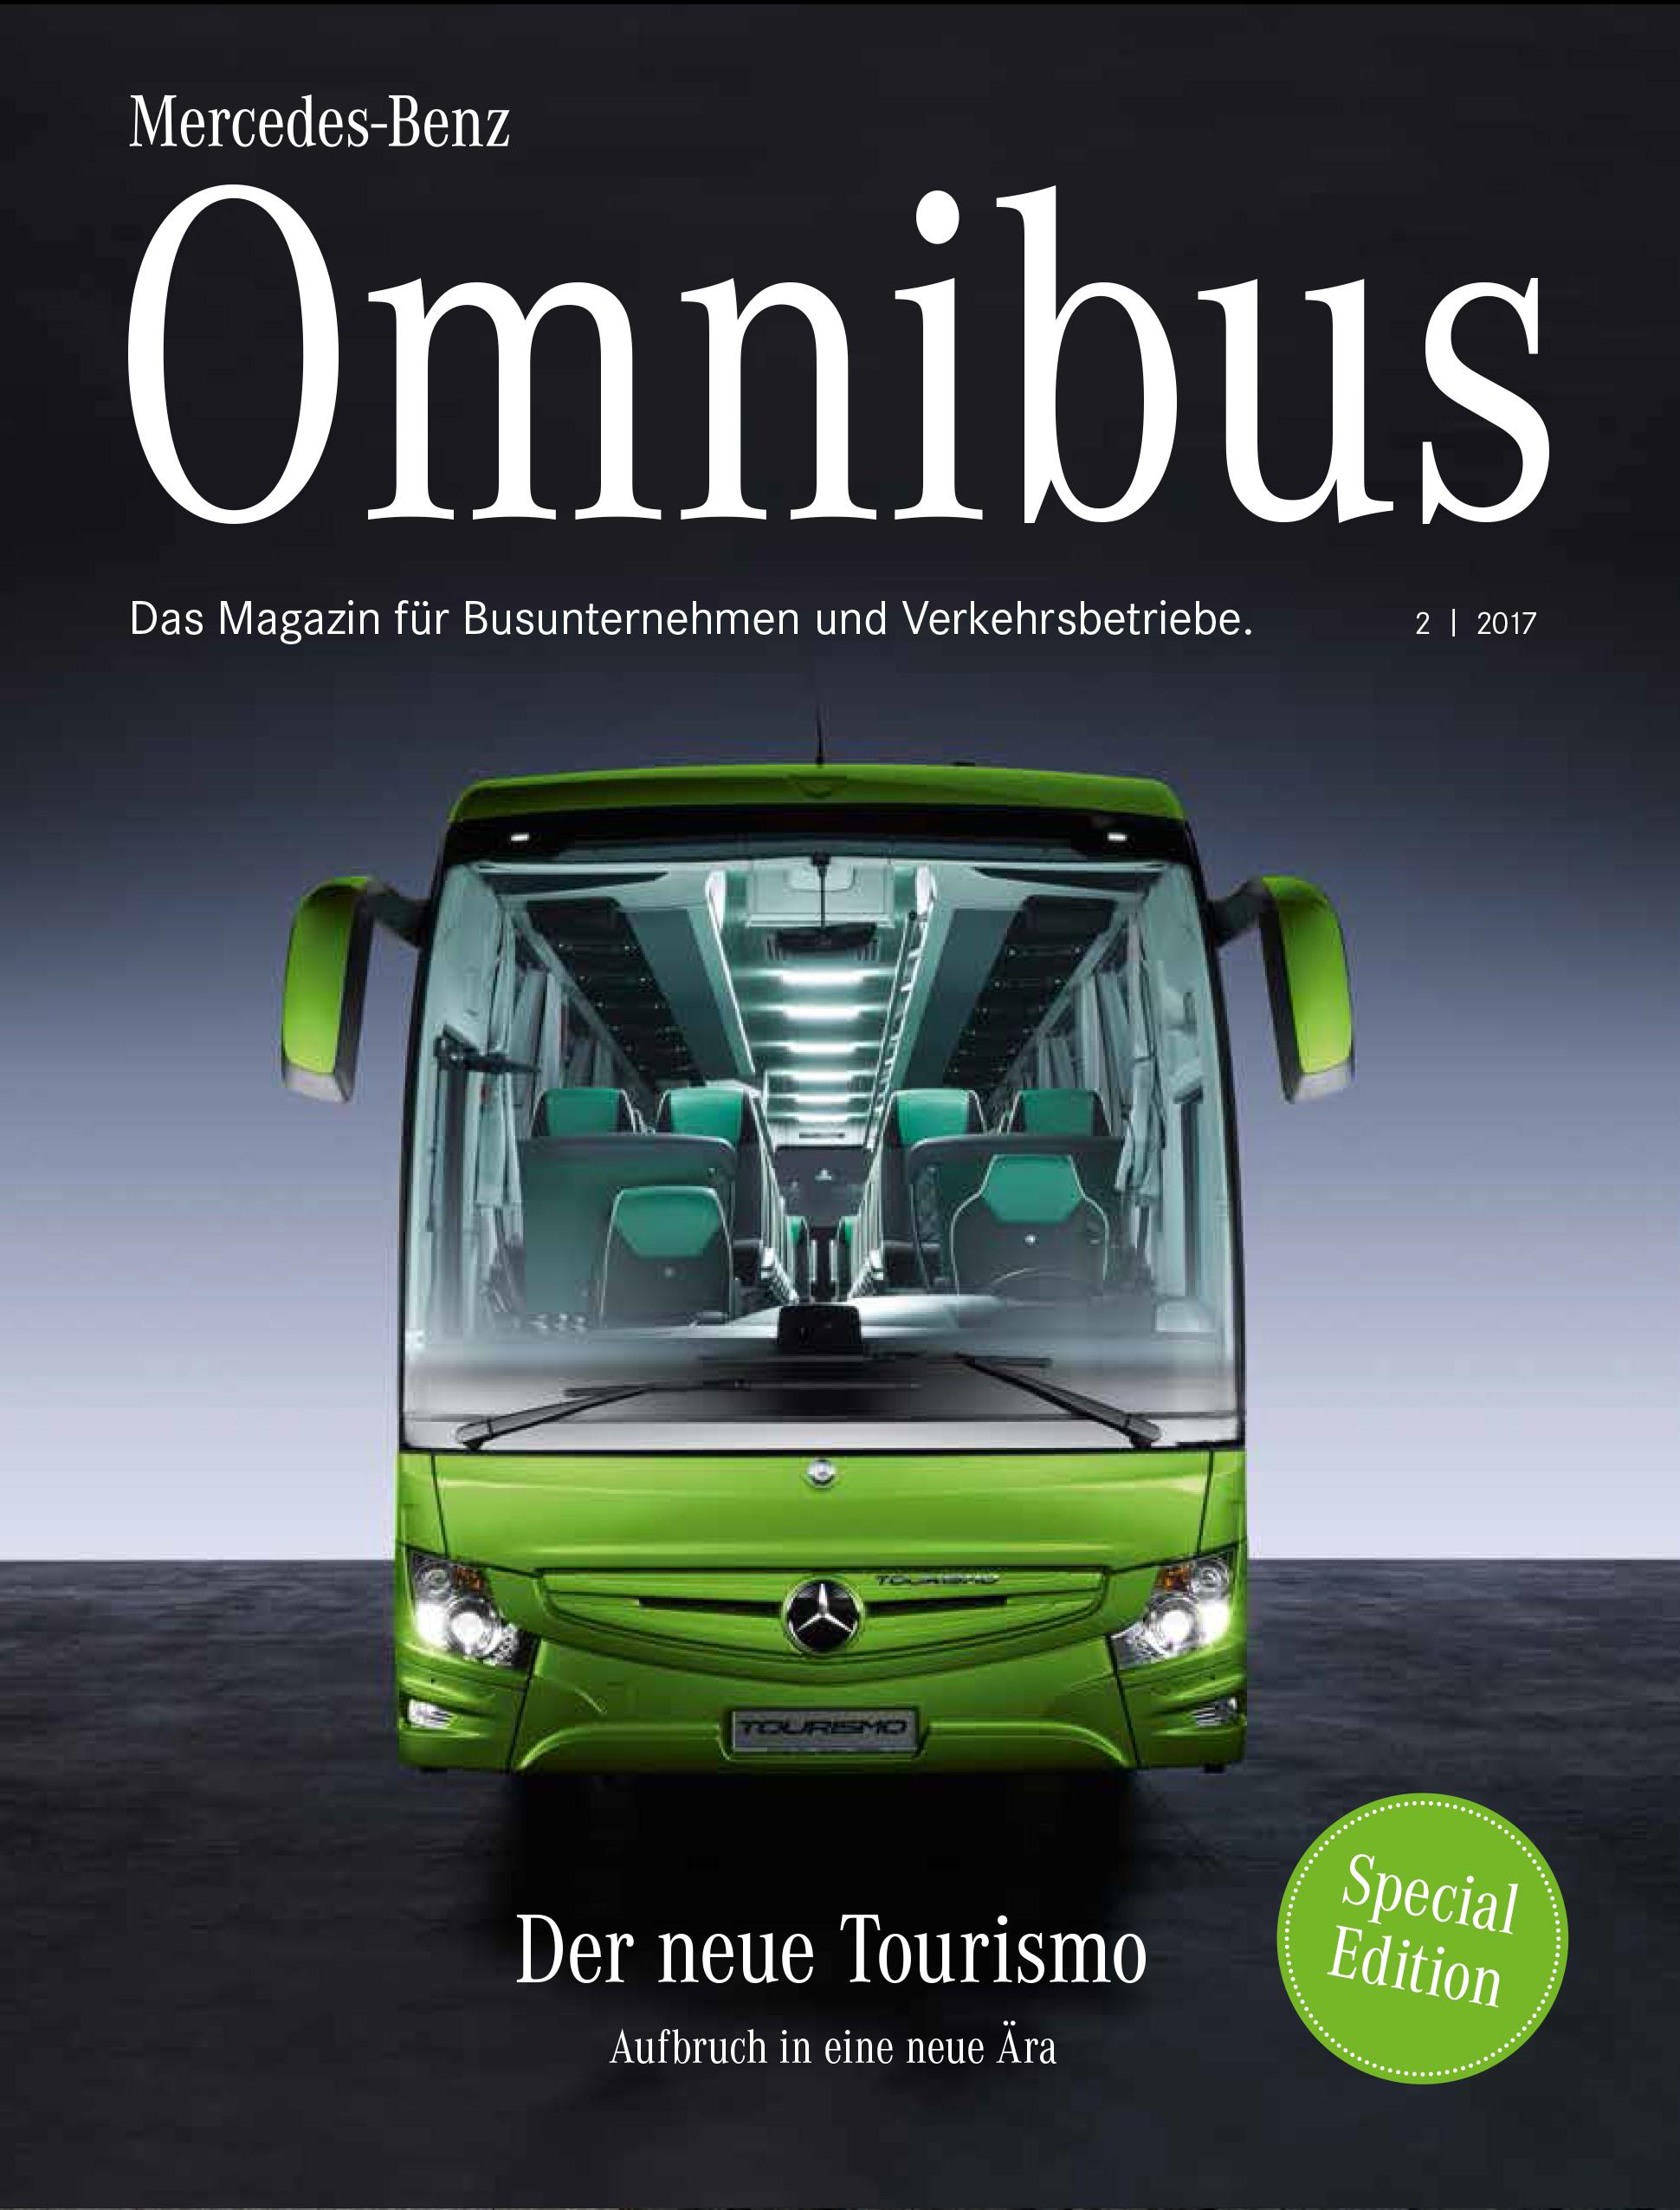 Mercedes Benz Omnibus Markenmagazin